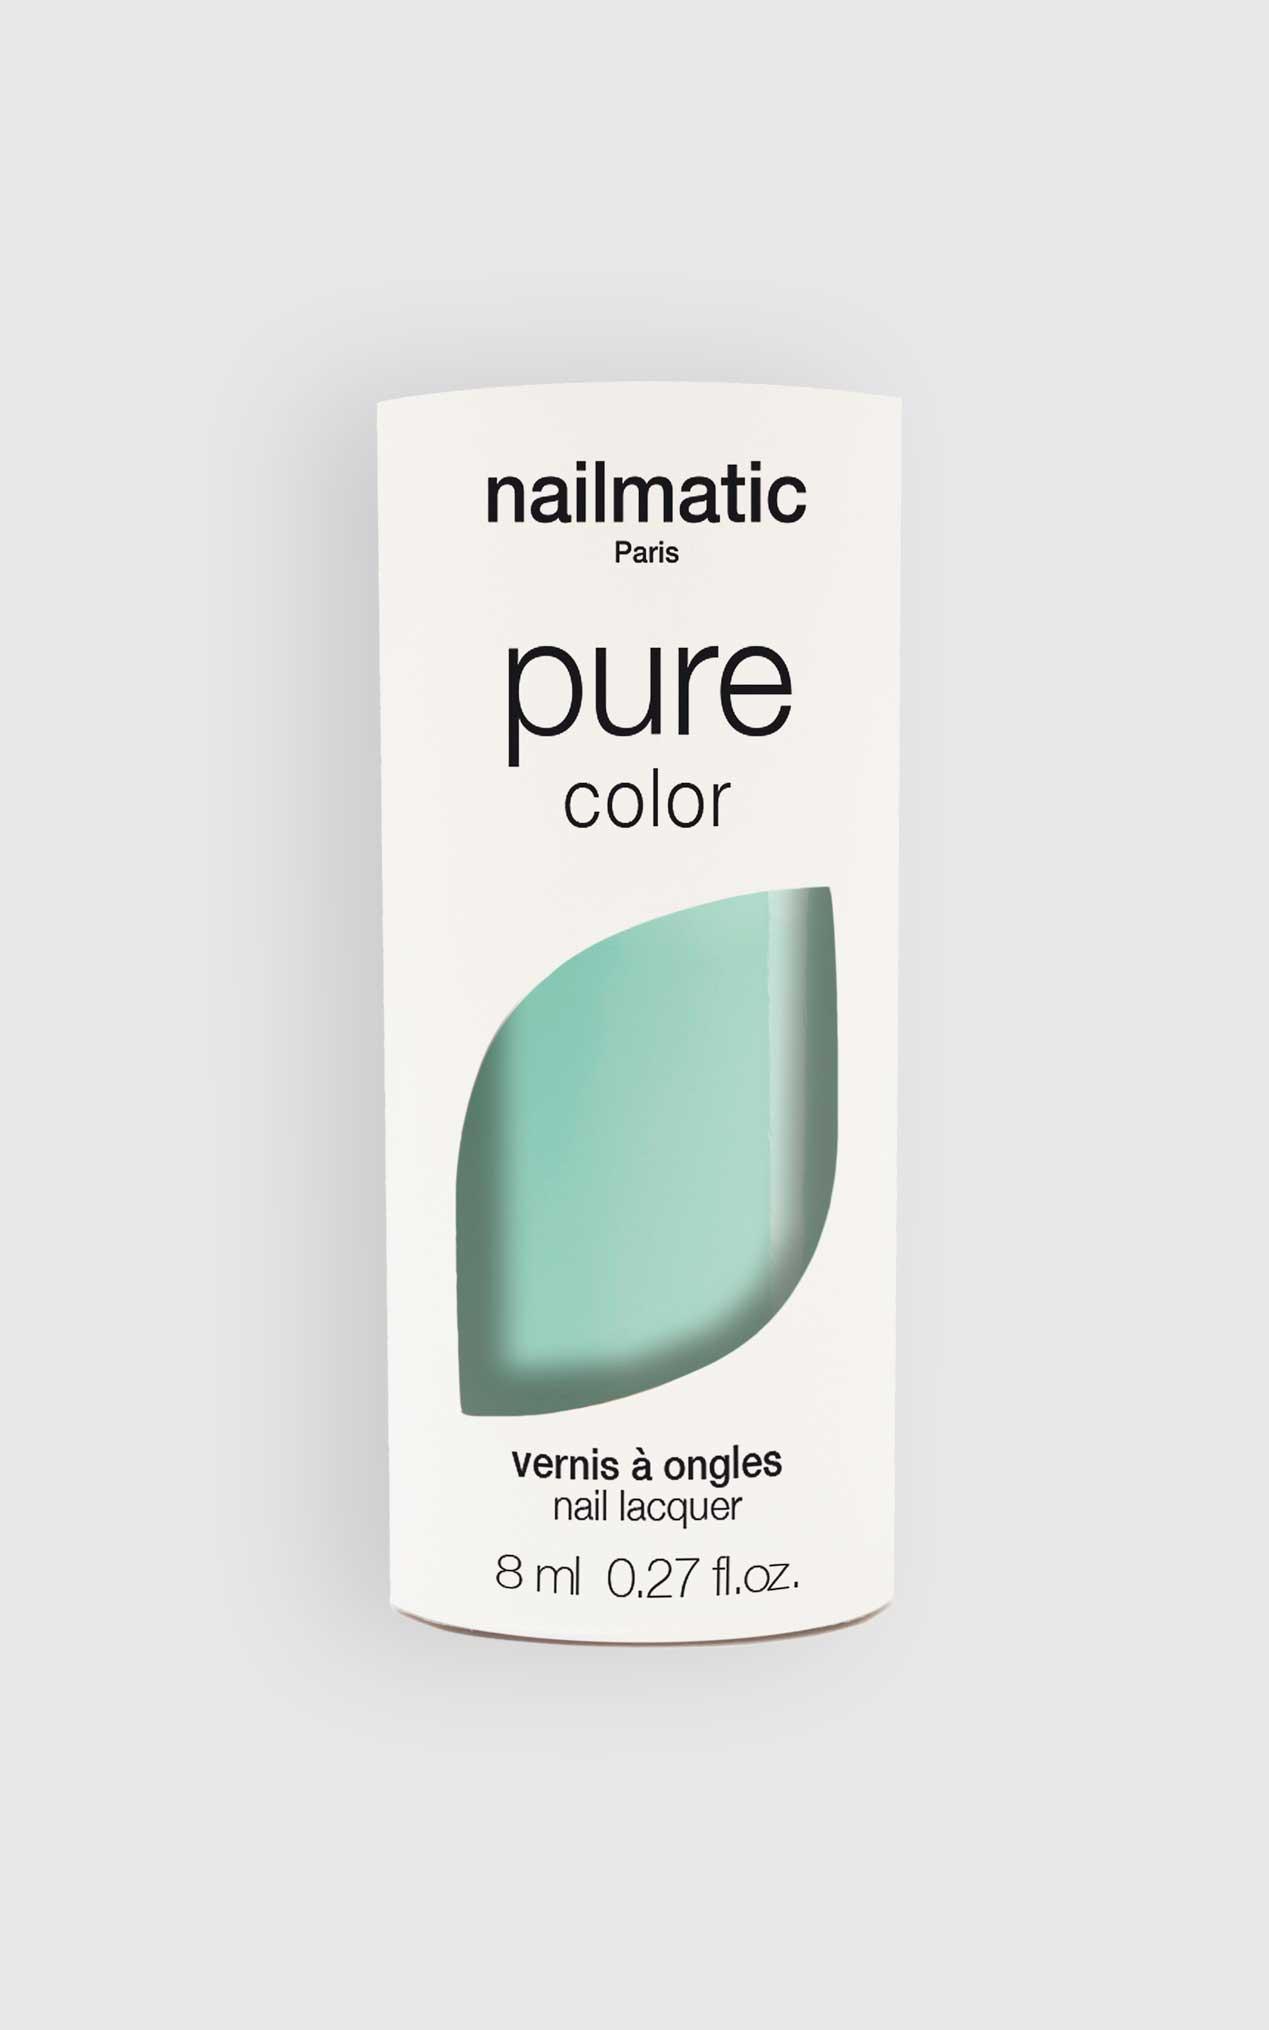 Nailmatic - Pure Color Mona Nail Polish in Aqua, Sage, hi-res image number null